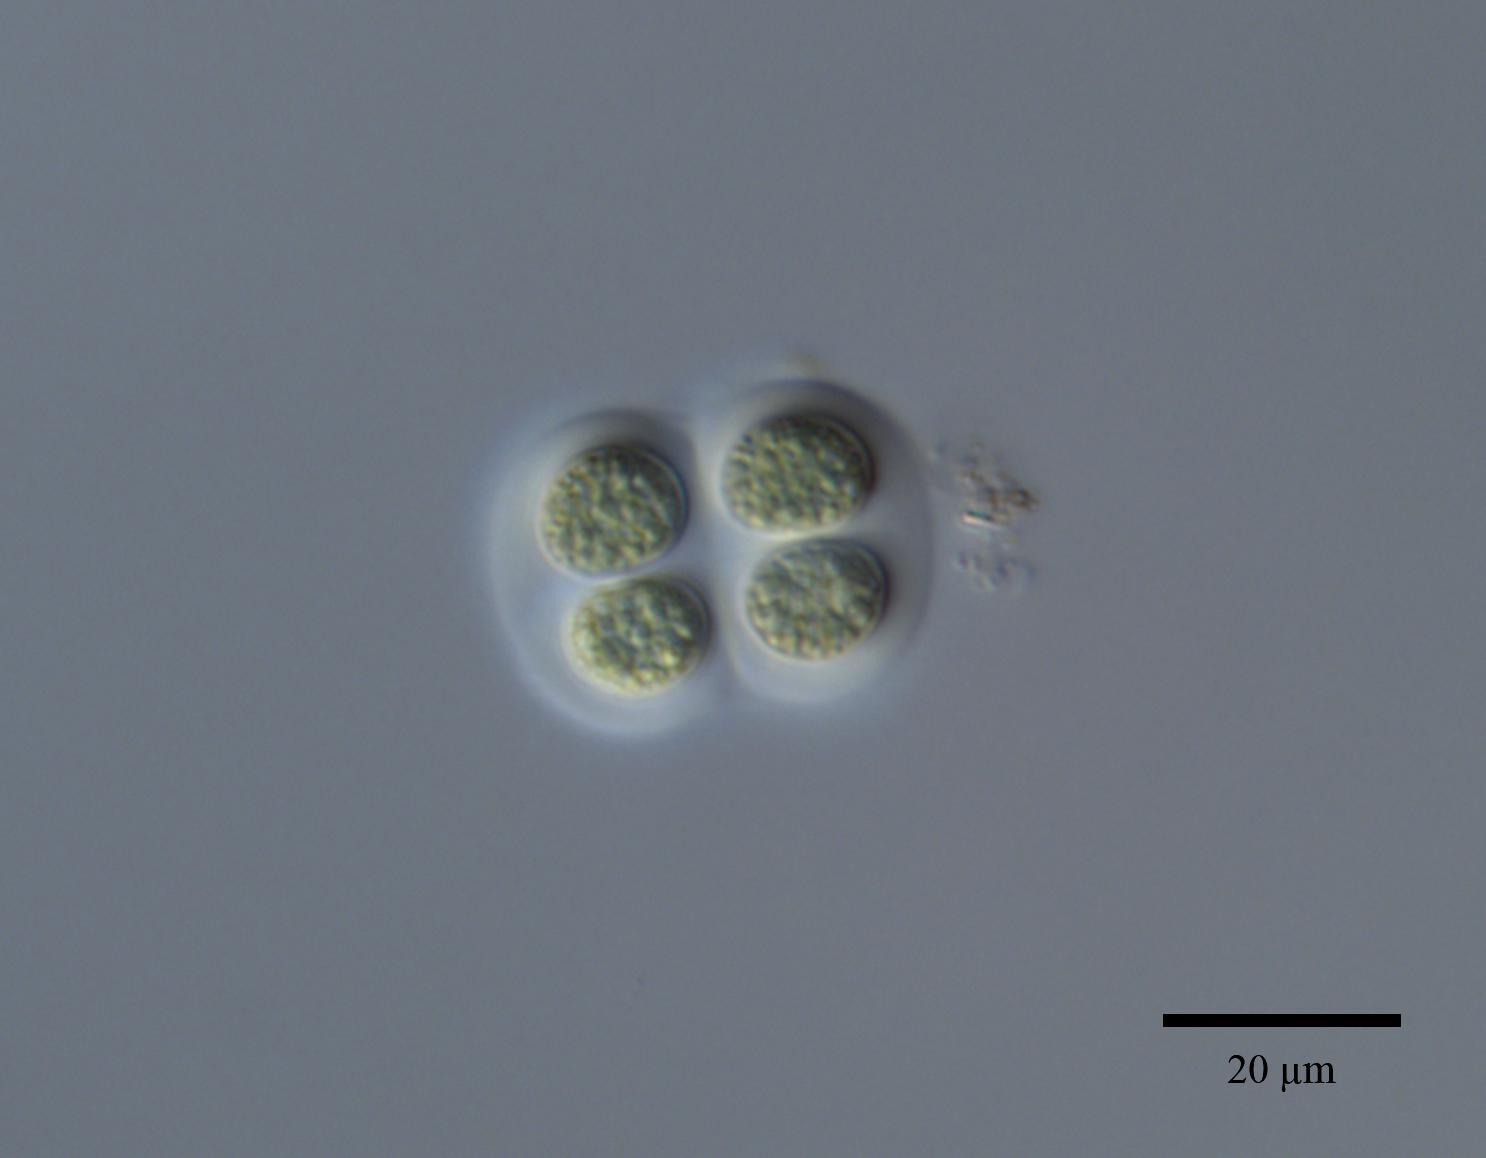 Chroococcus Minutus K 252 Tz N 228 Geli Nordic Microalgae